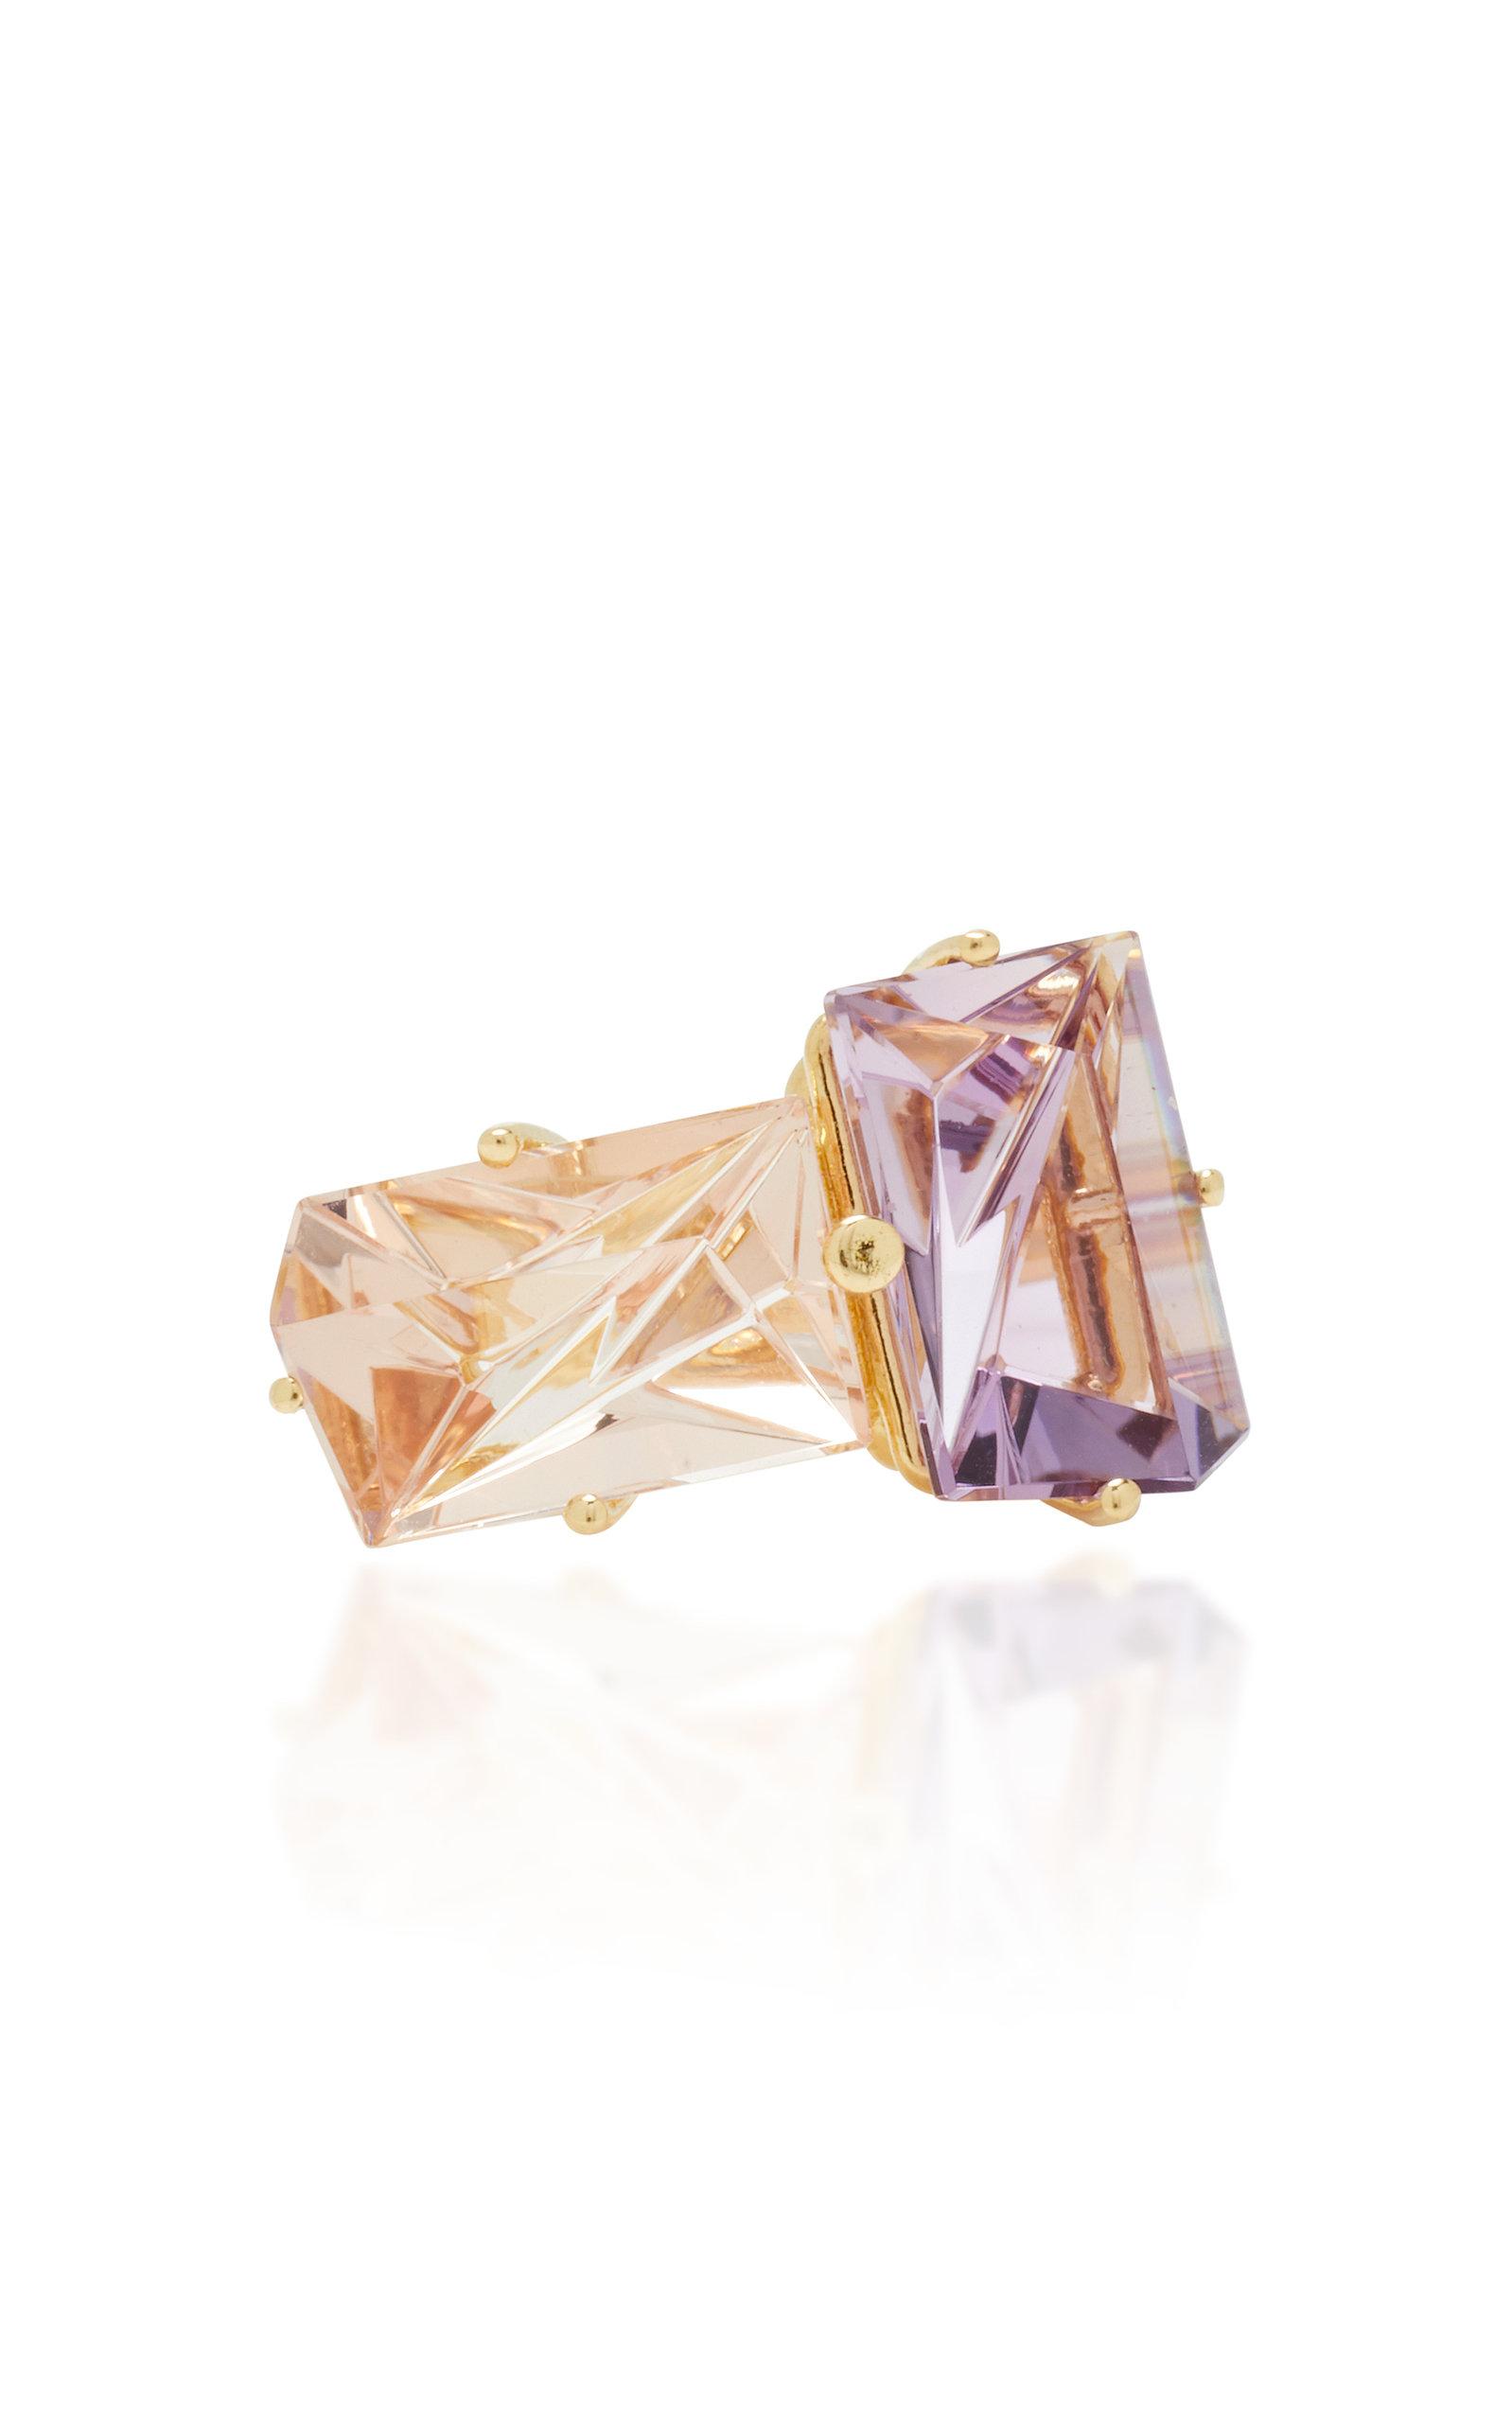 Women's 18K Gold; Morganite and Amethyst Ring